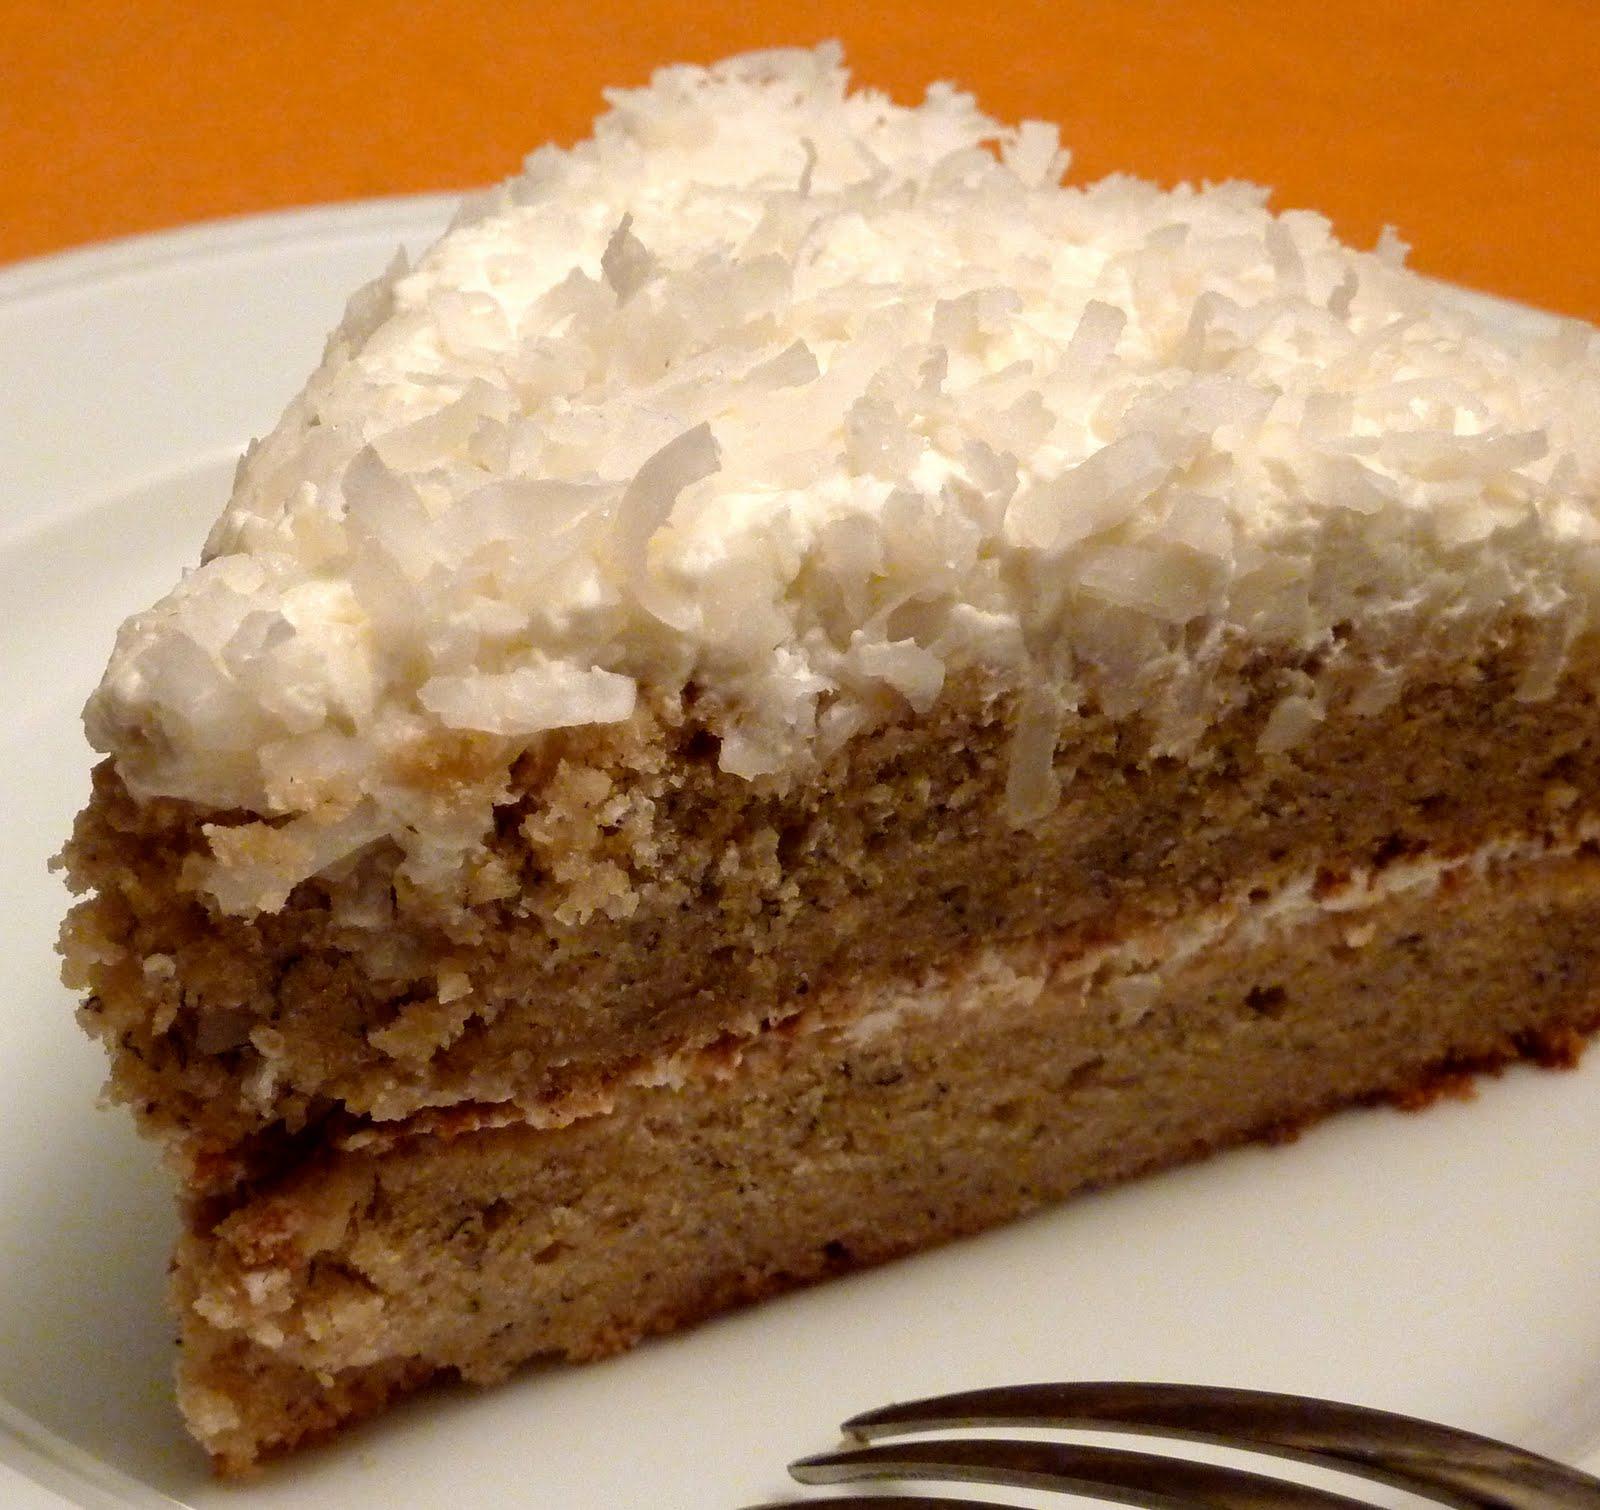 beurrista: banana rum coconut layer cake